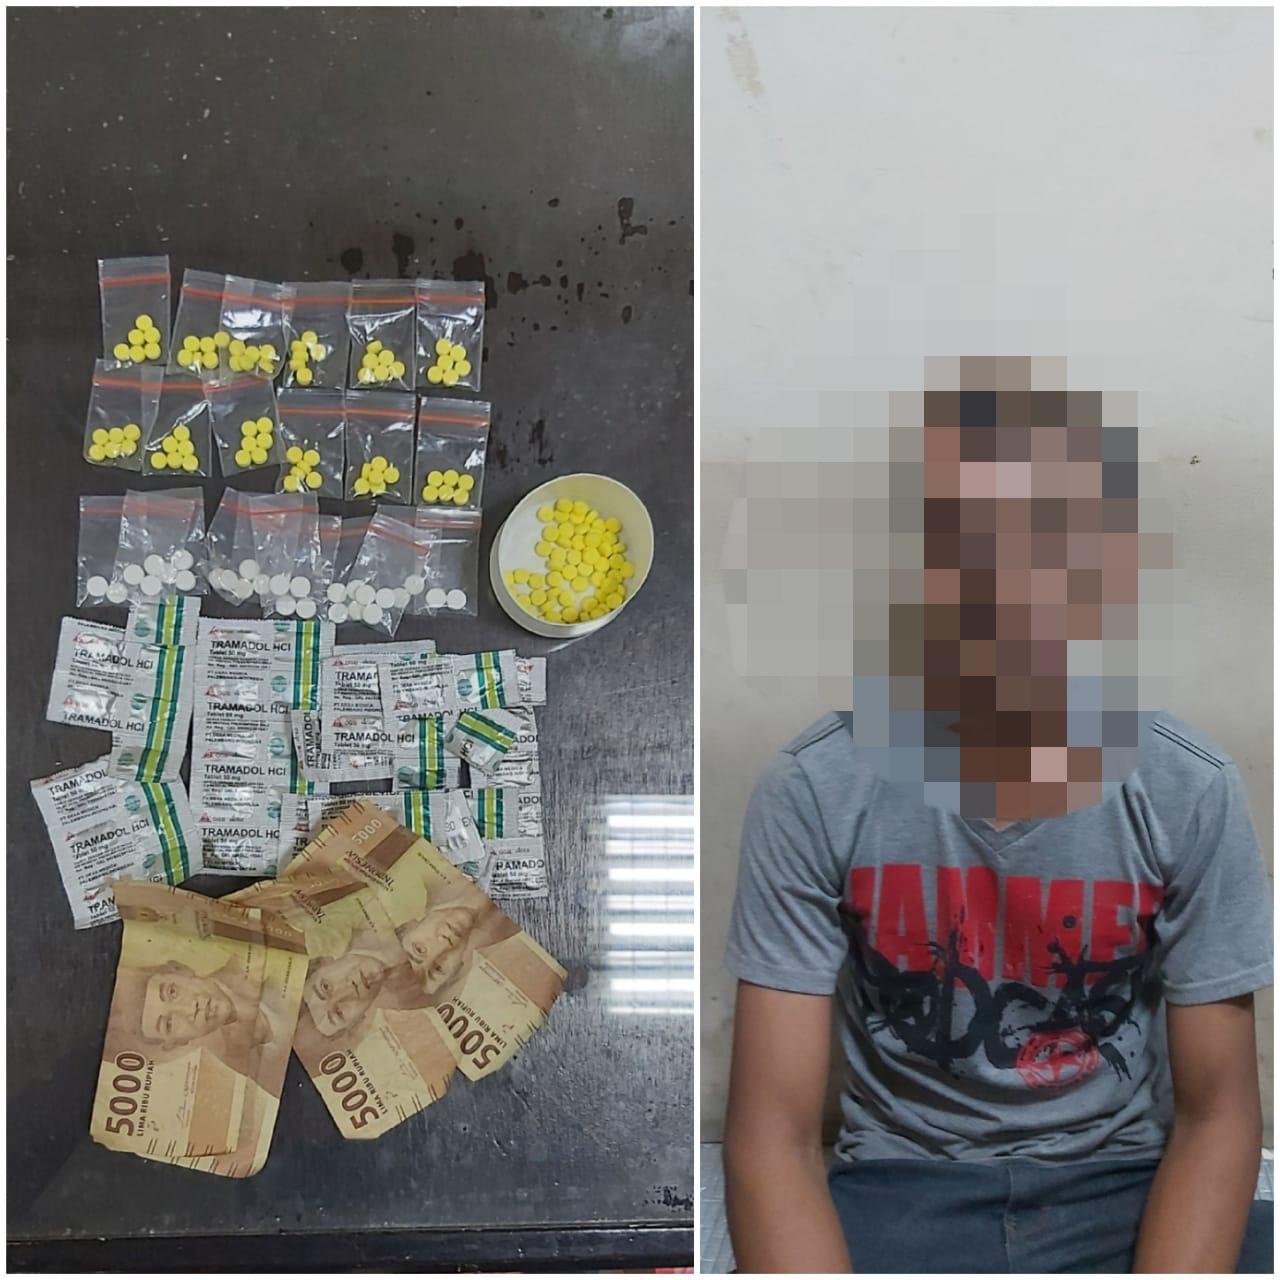 Satresnarkoba Polresta Tangerang Tangkap Pengedar Obat Terlarang Asal Aceh